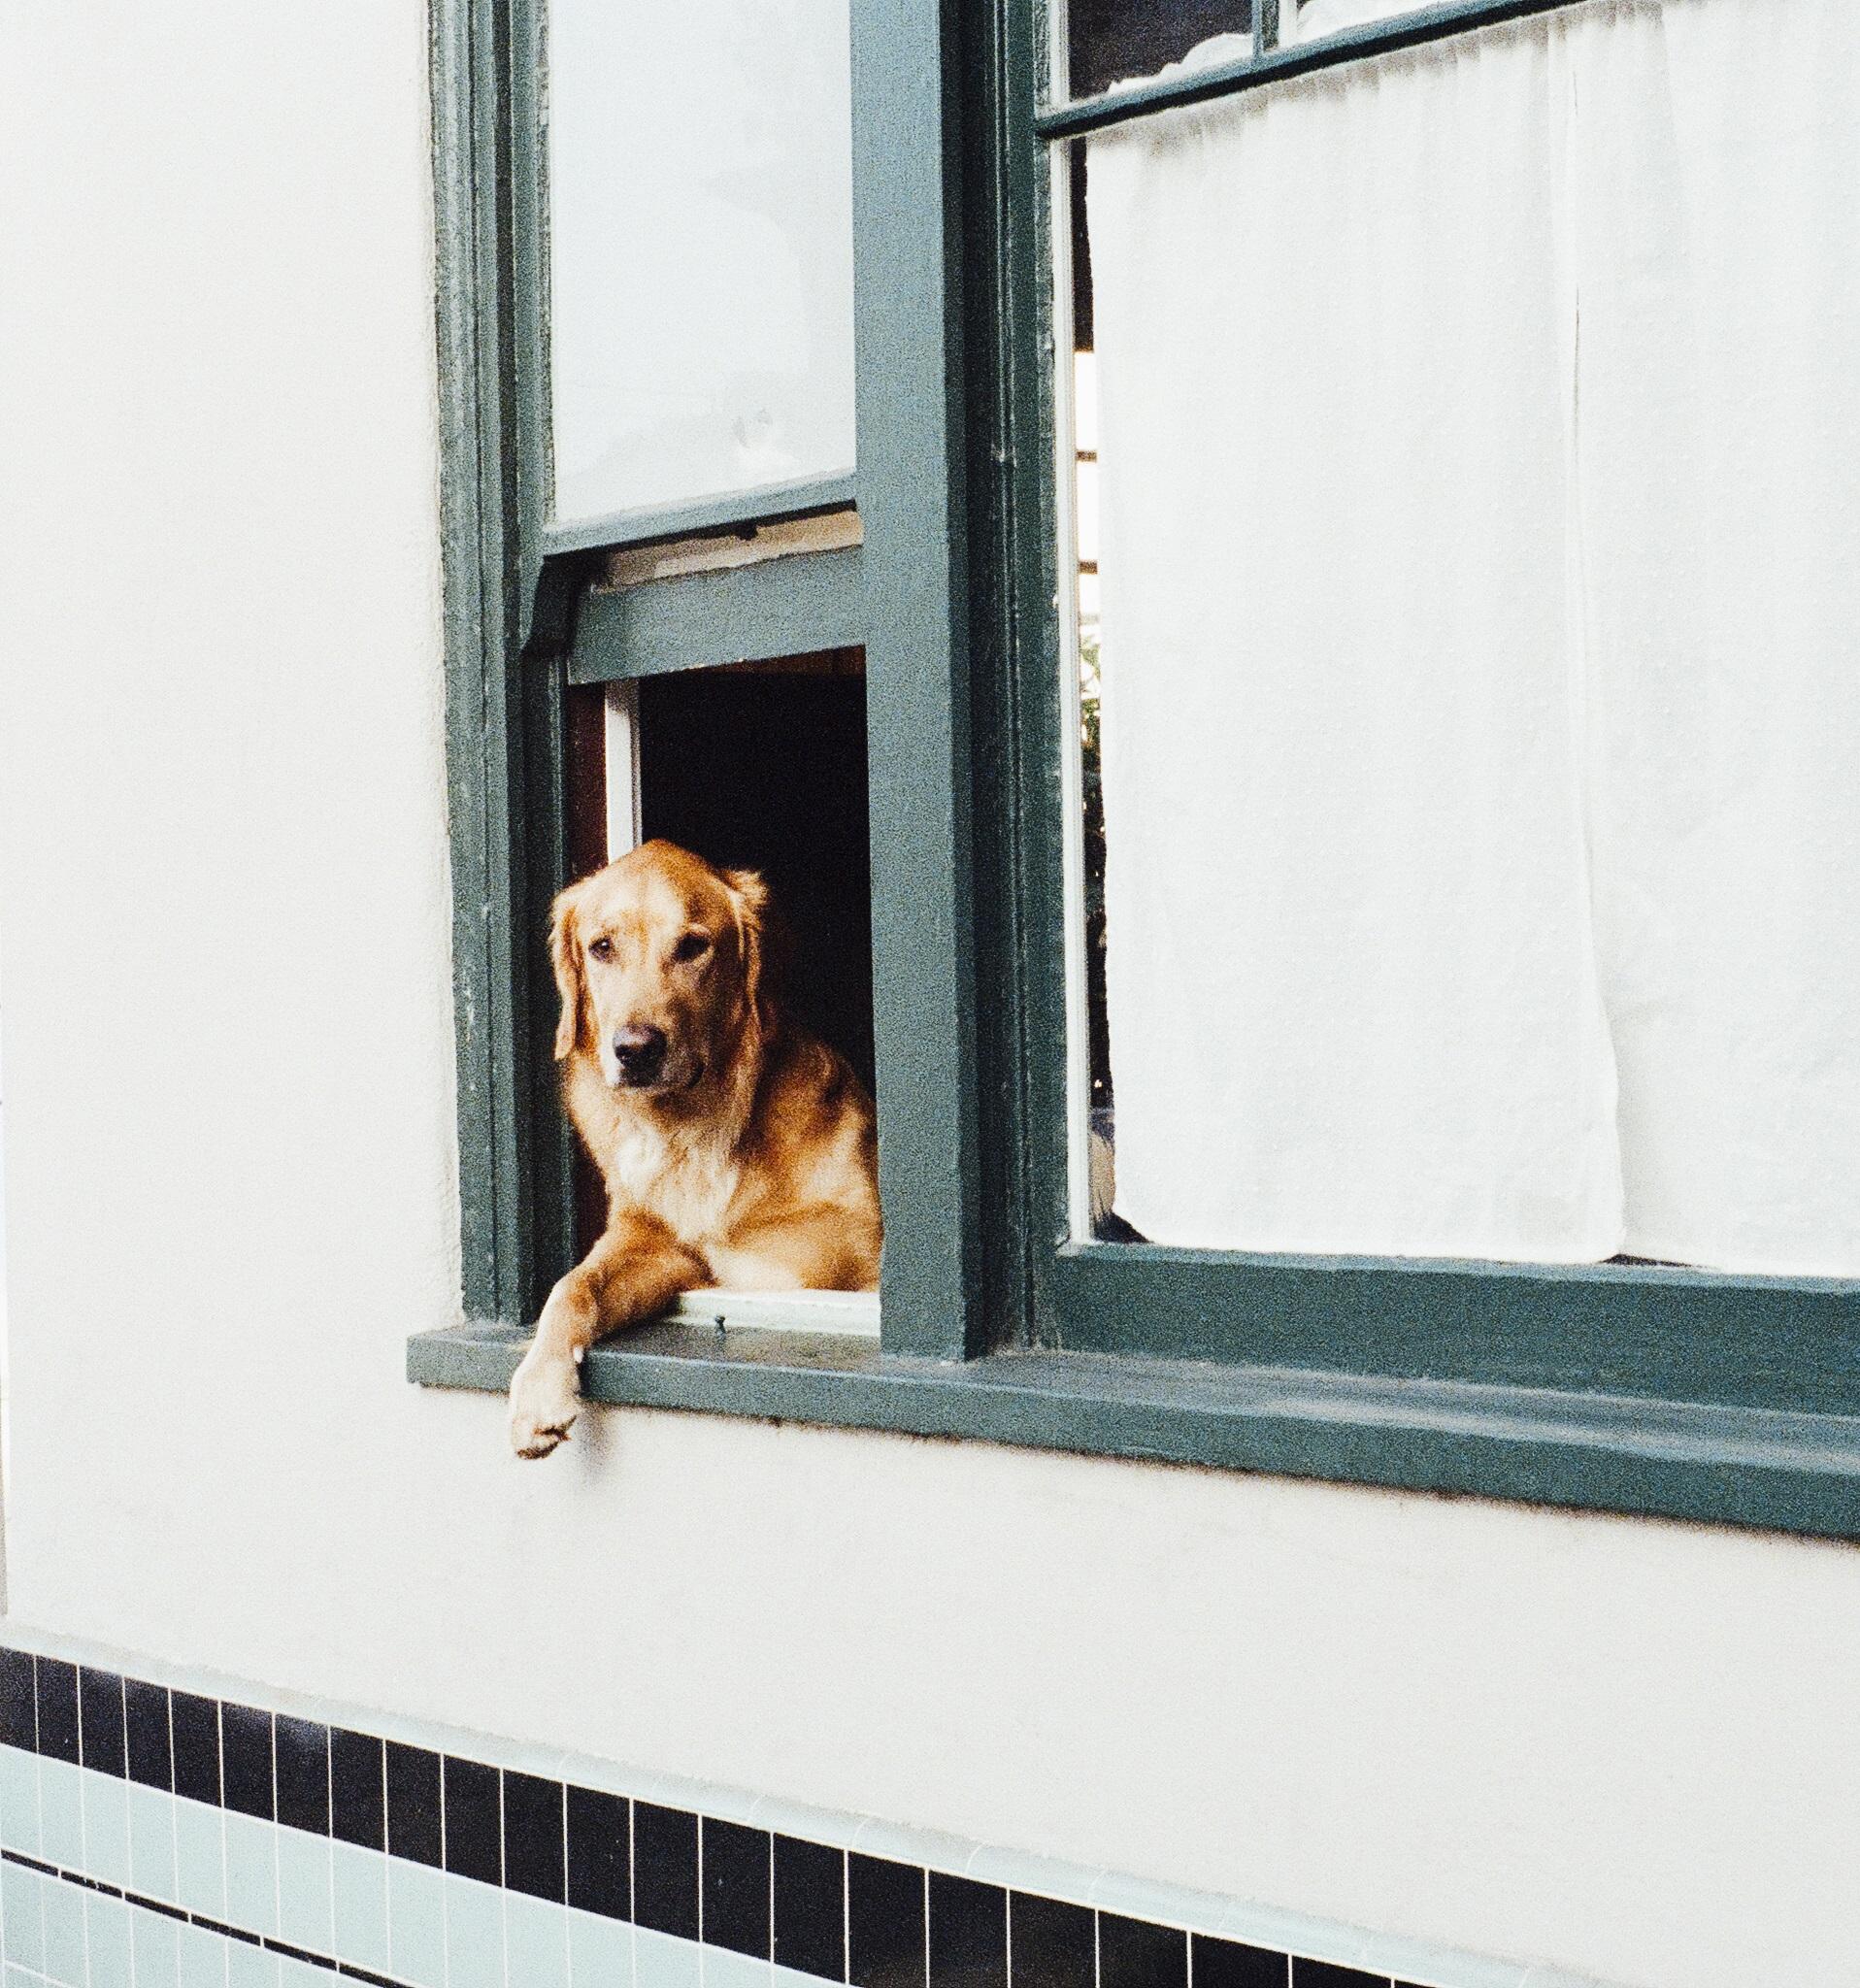 praktische zaken overlijden hond